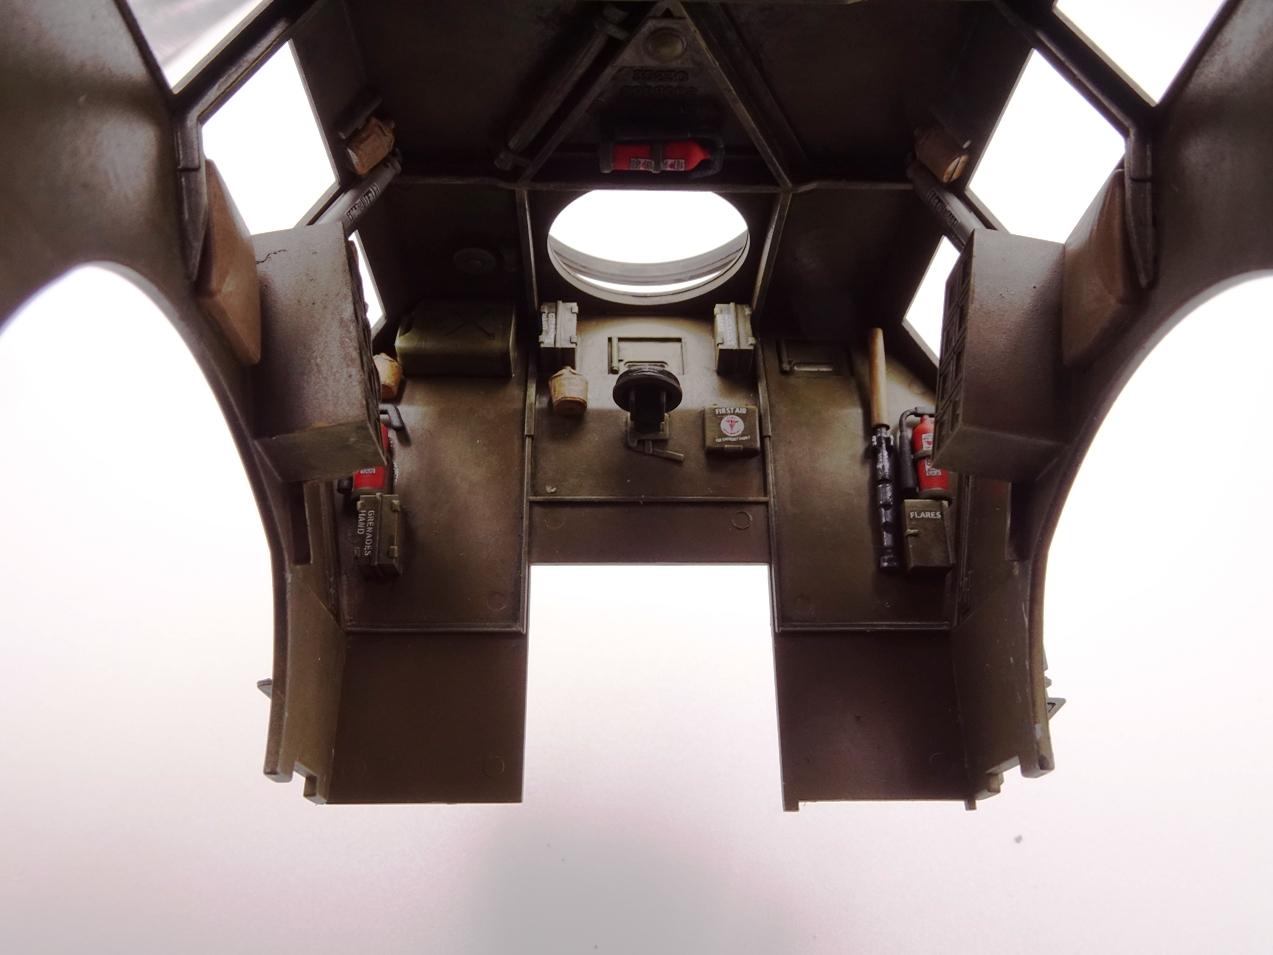 [Tamiya 1/35] M26 Armored tank recovery vehicle réf. 35244 - Page 3 M26-1510-5